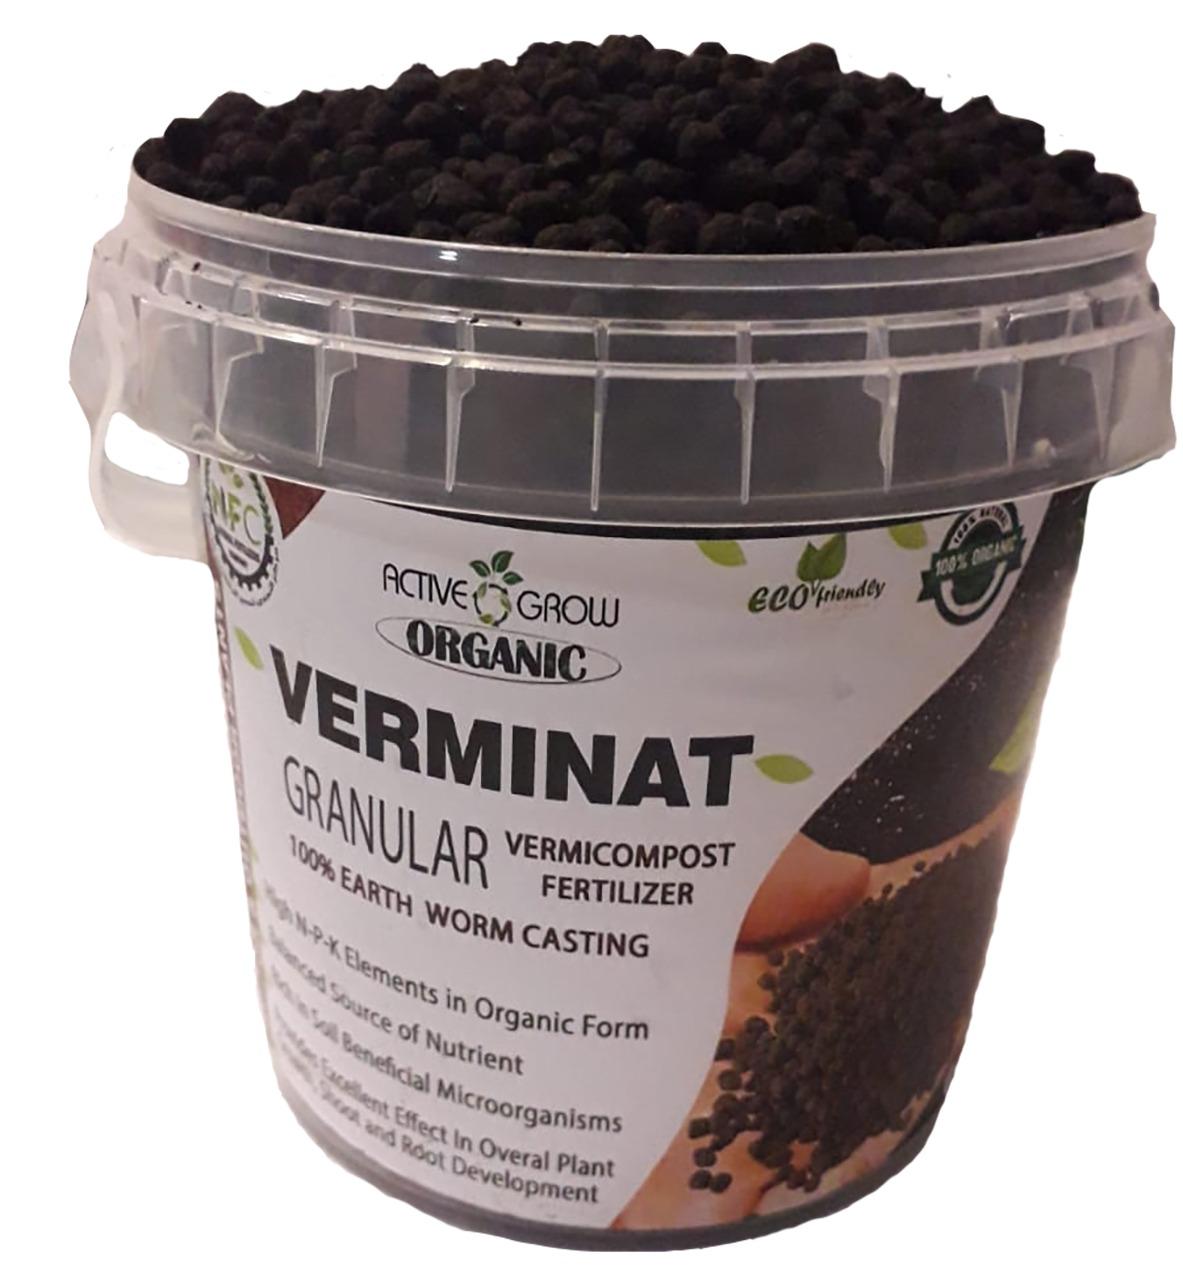 granular vermicompost fertilizer Soil Fertilizer Pesticide